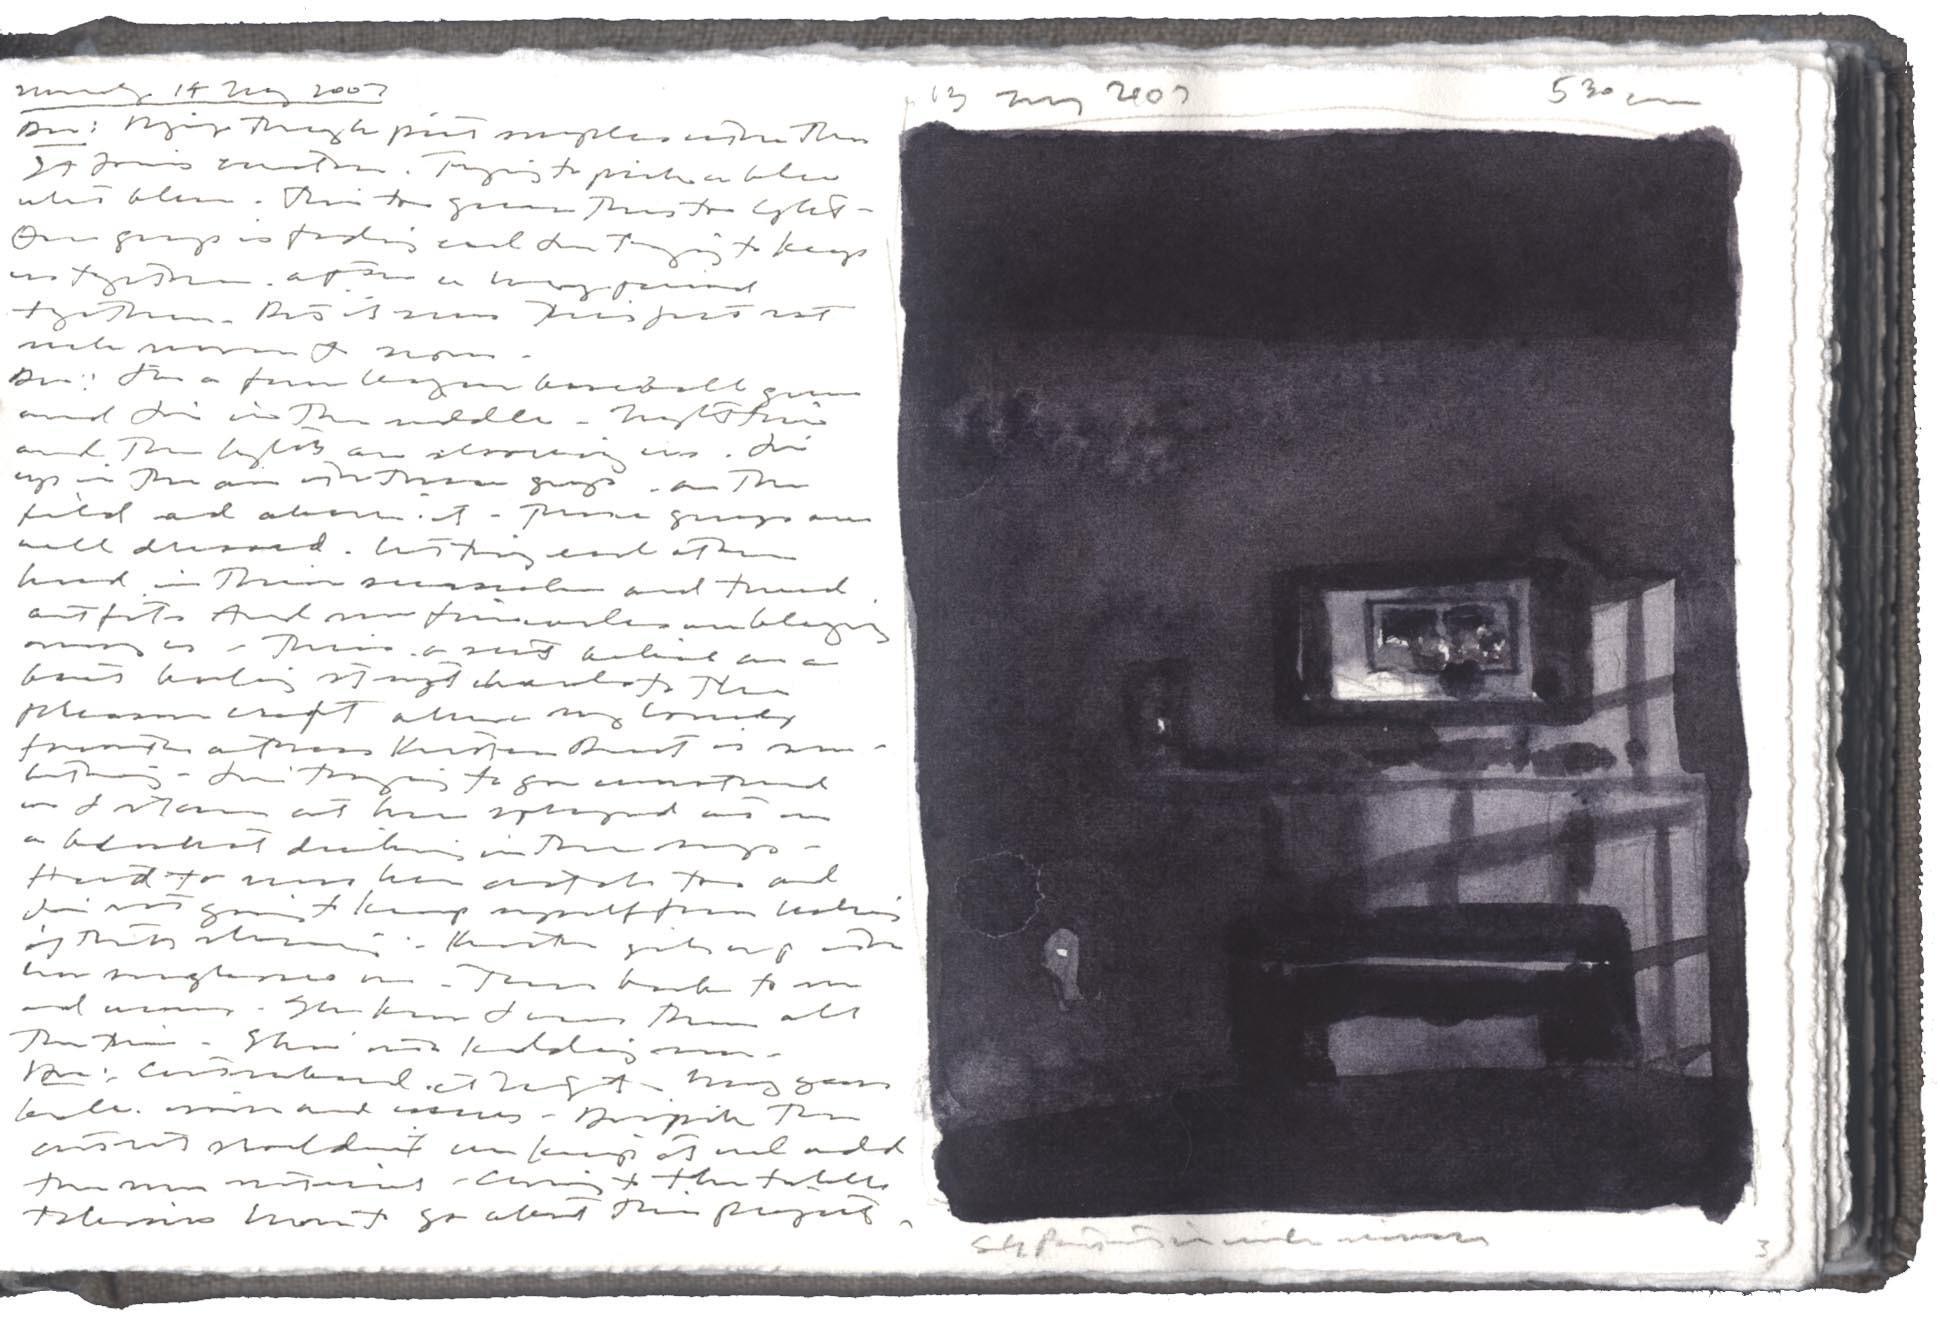 Interior with Self-Portrait image